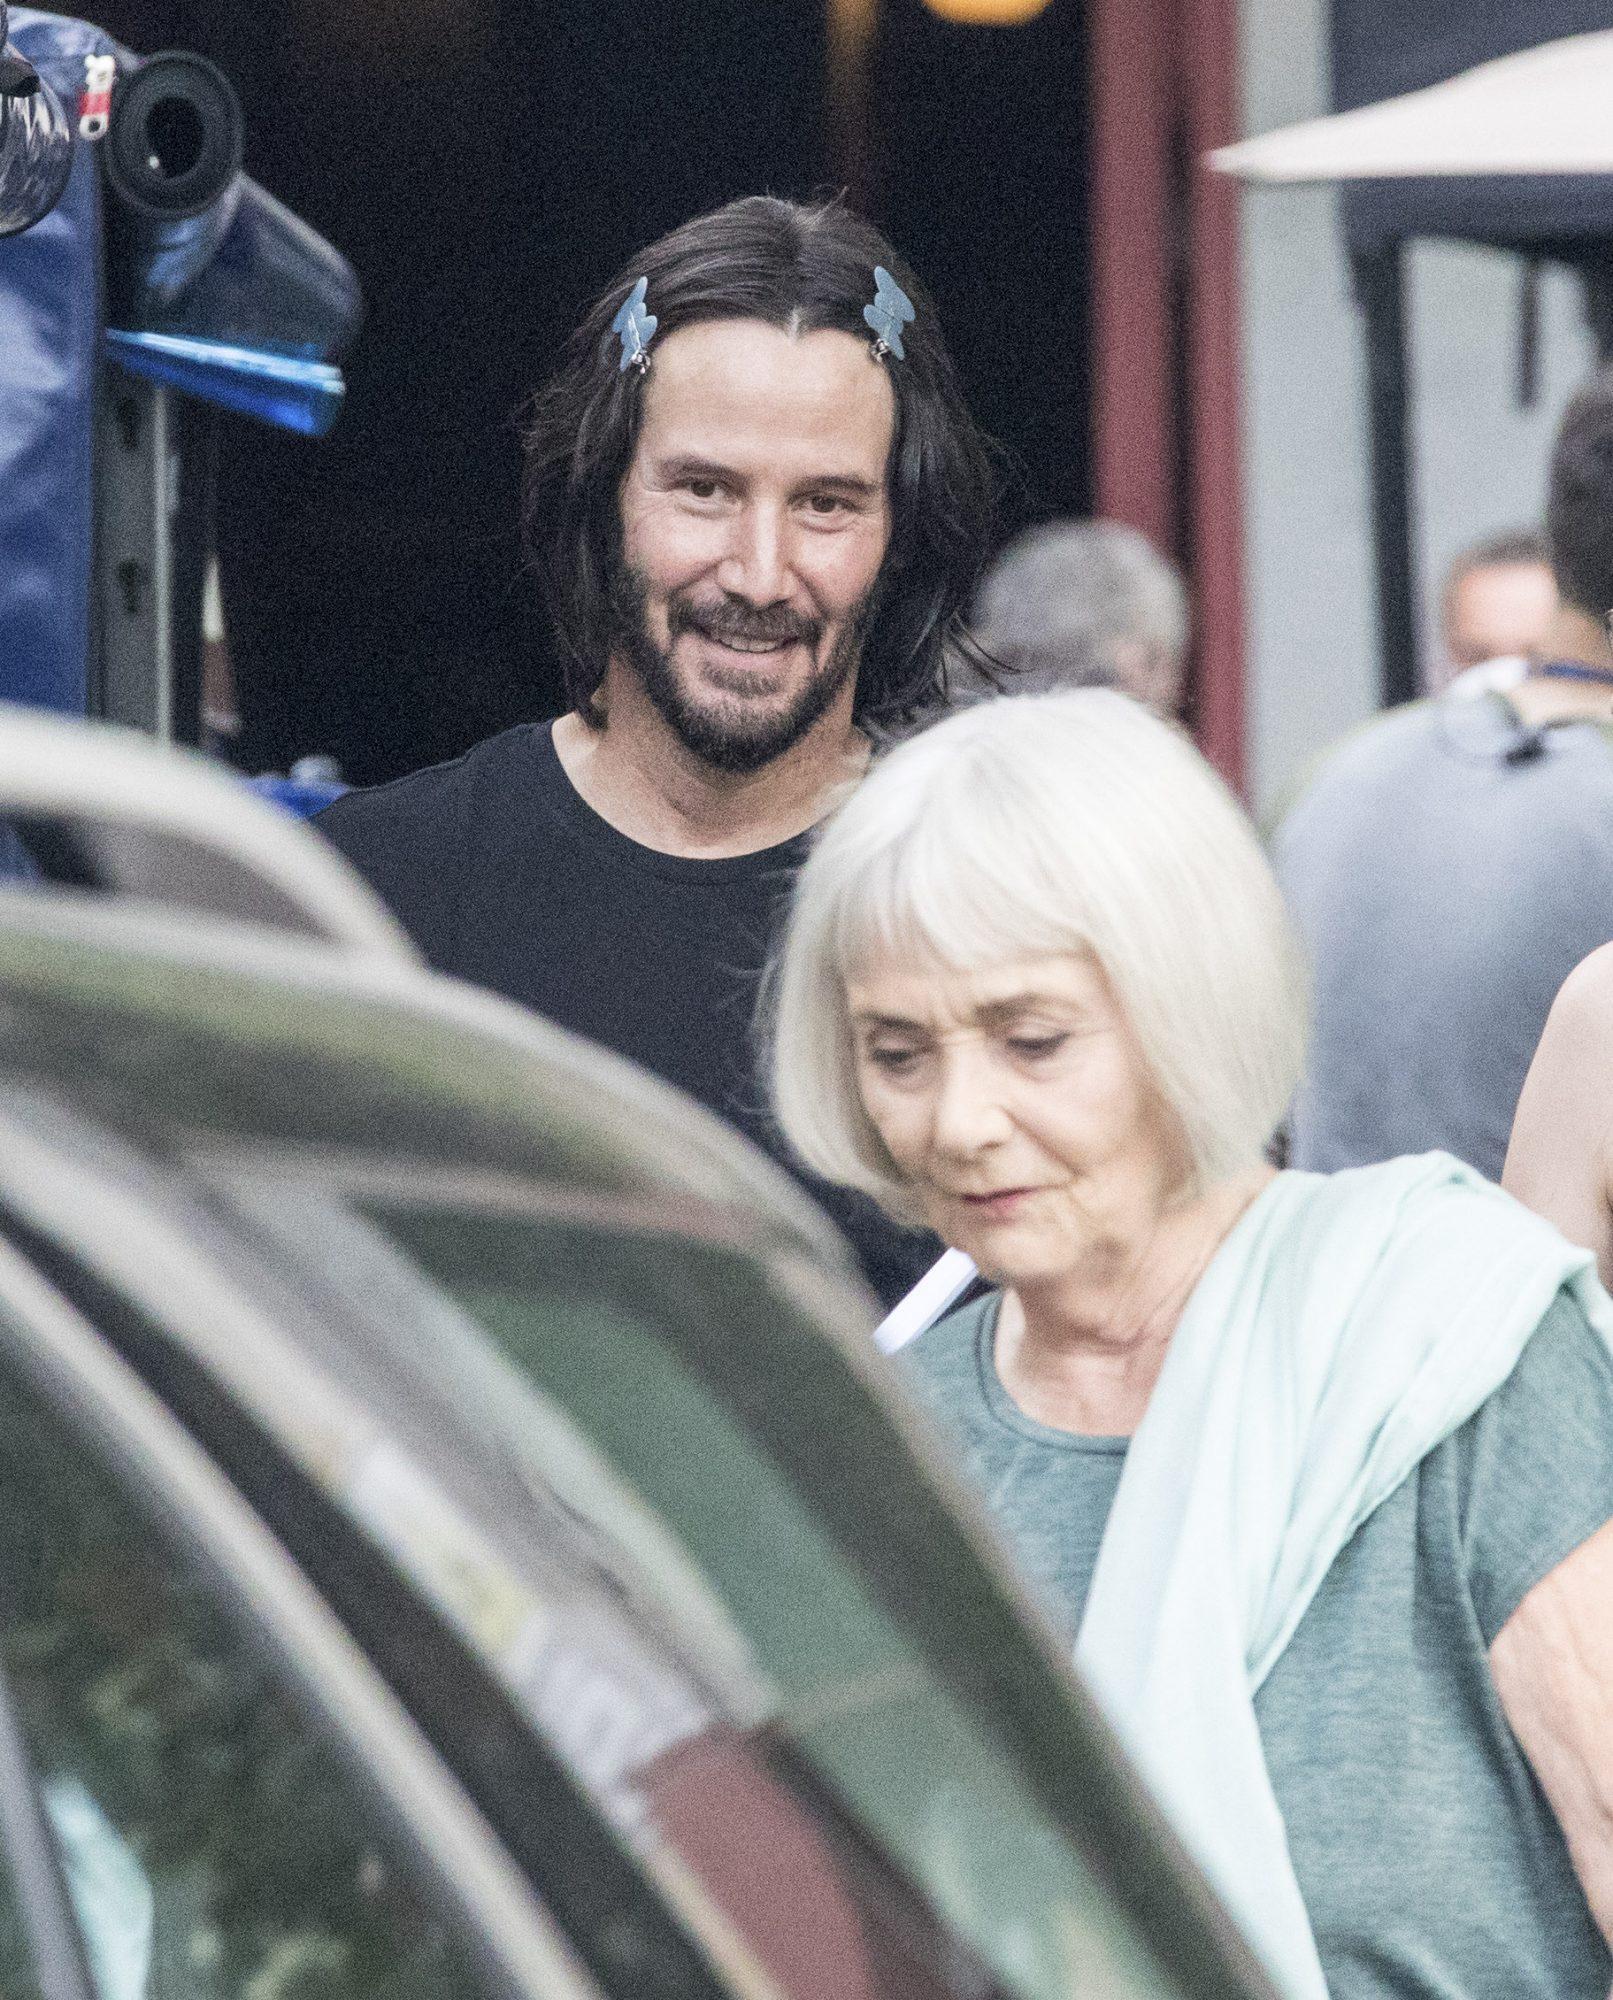 First Photos of Keanu Reeves with Long Dark Hair & Grips Filming 'John Wick'